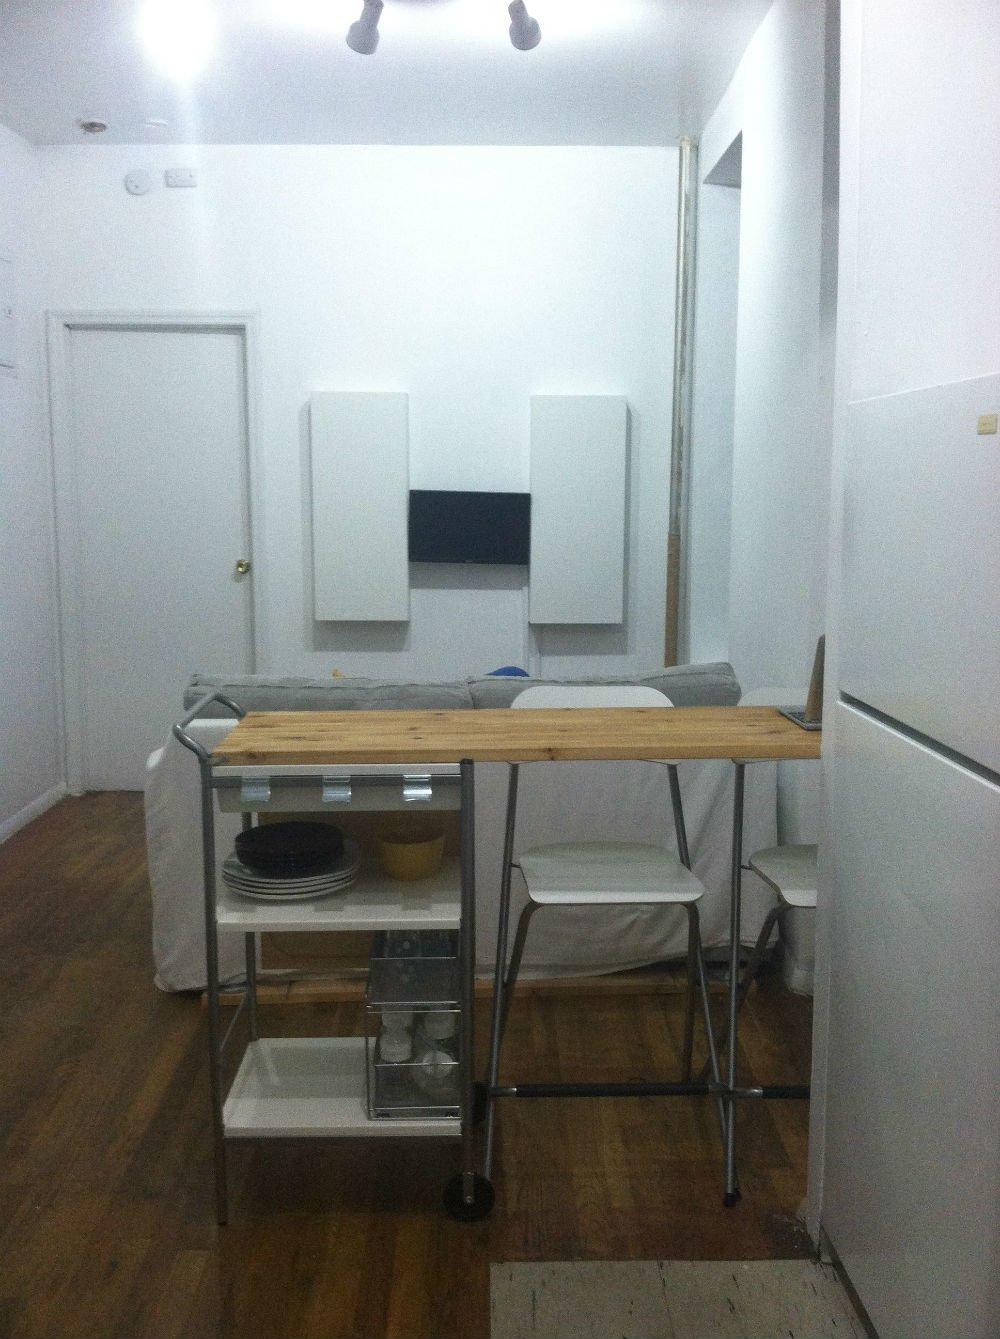 Breakfast Bar with Dish and Silverware Storage IKEA Hackers IKEA Hackers